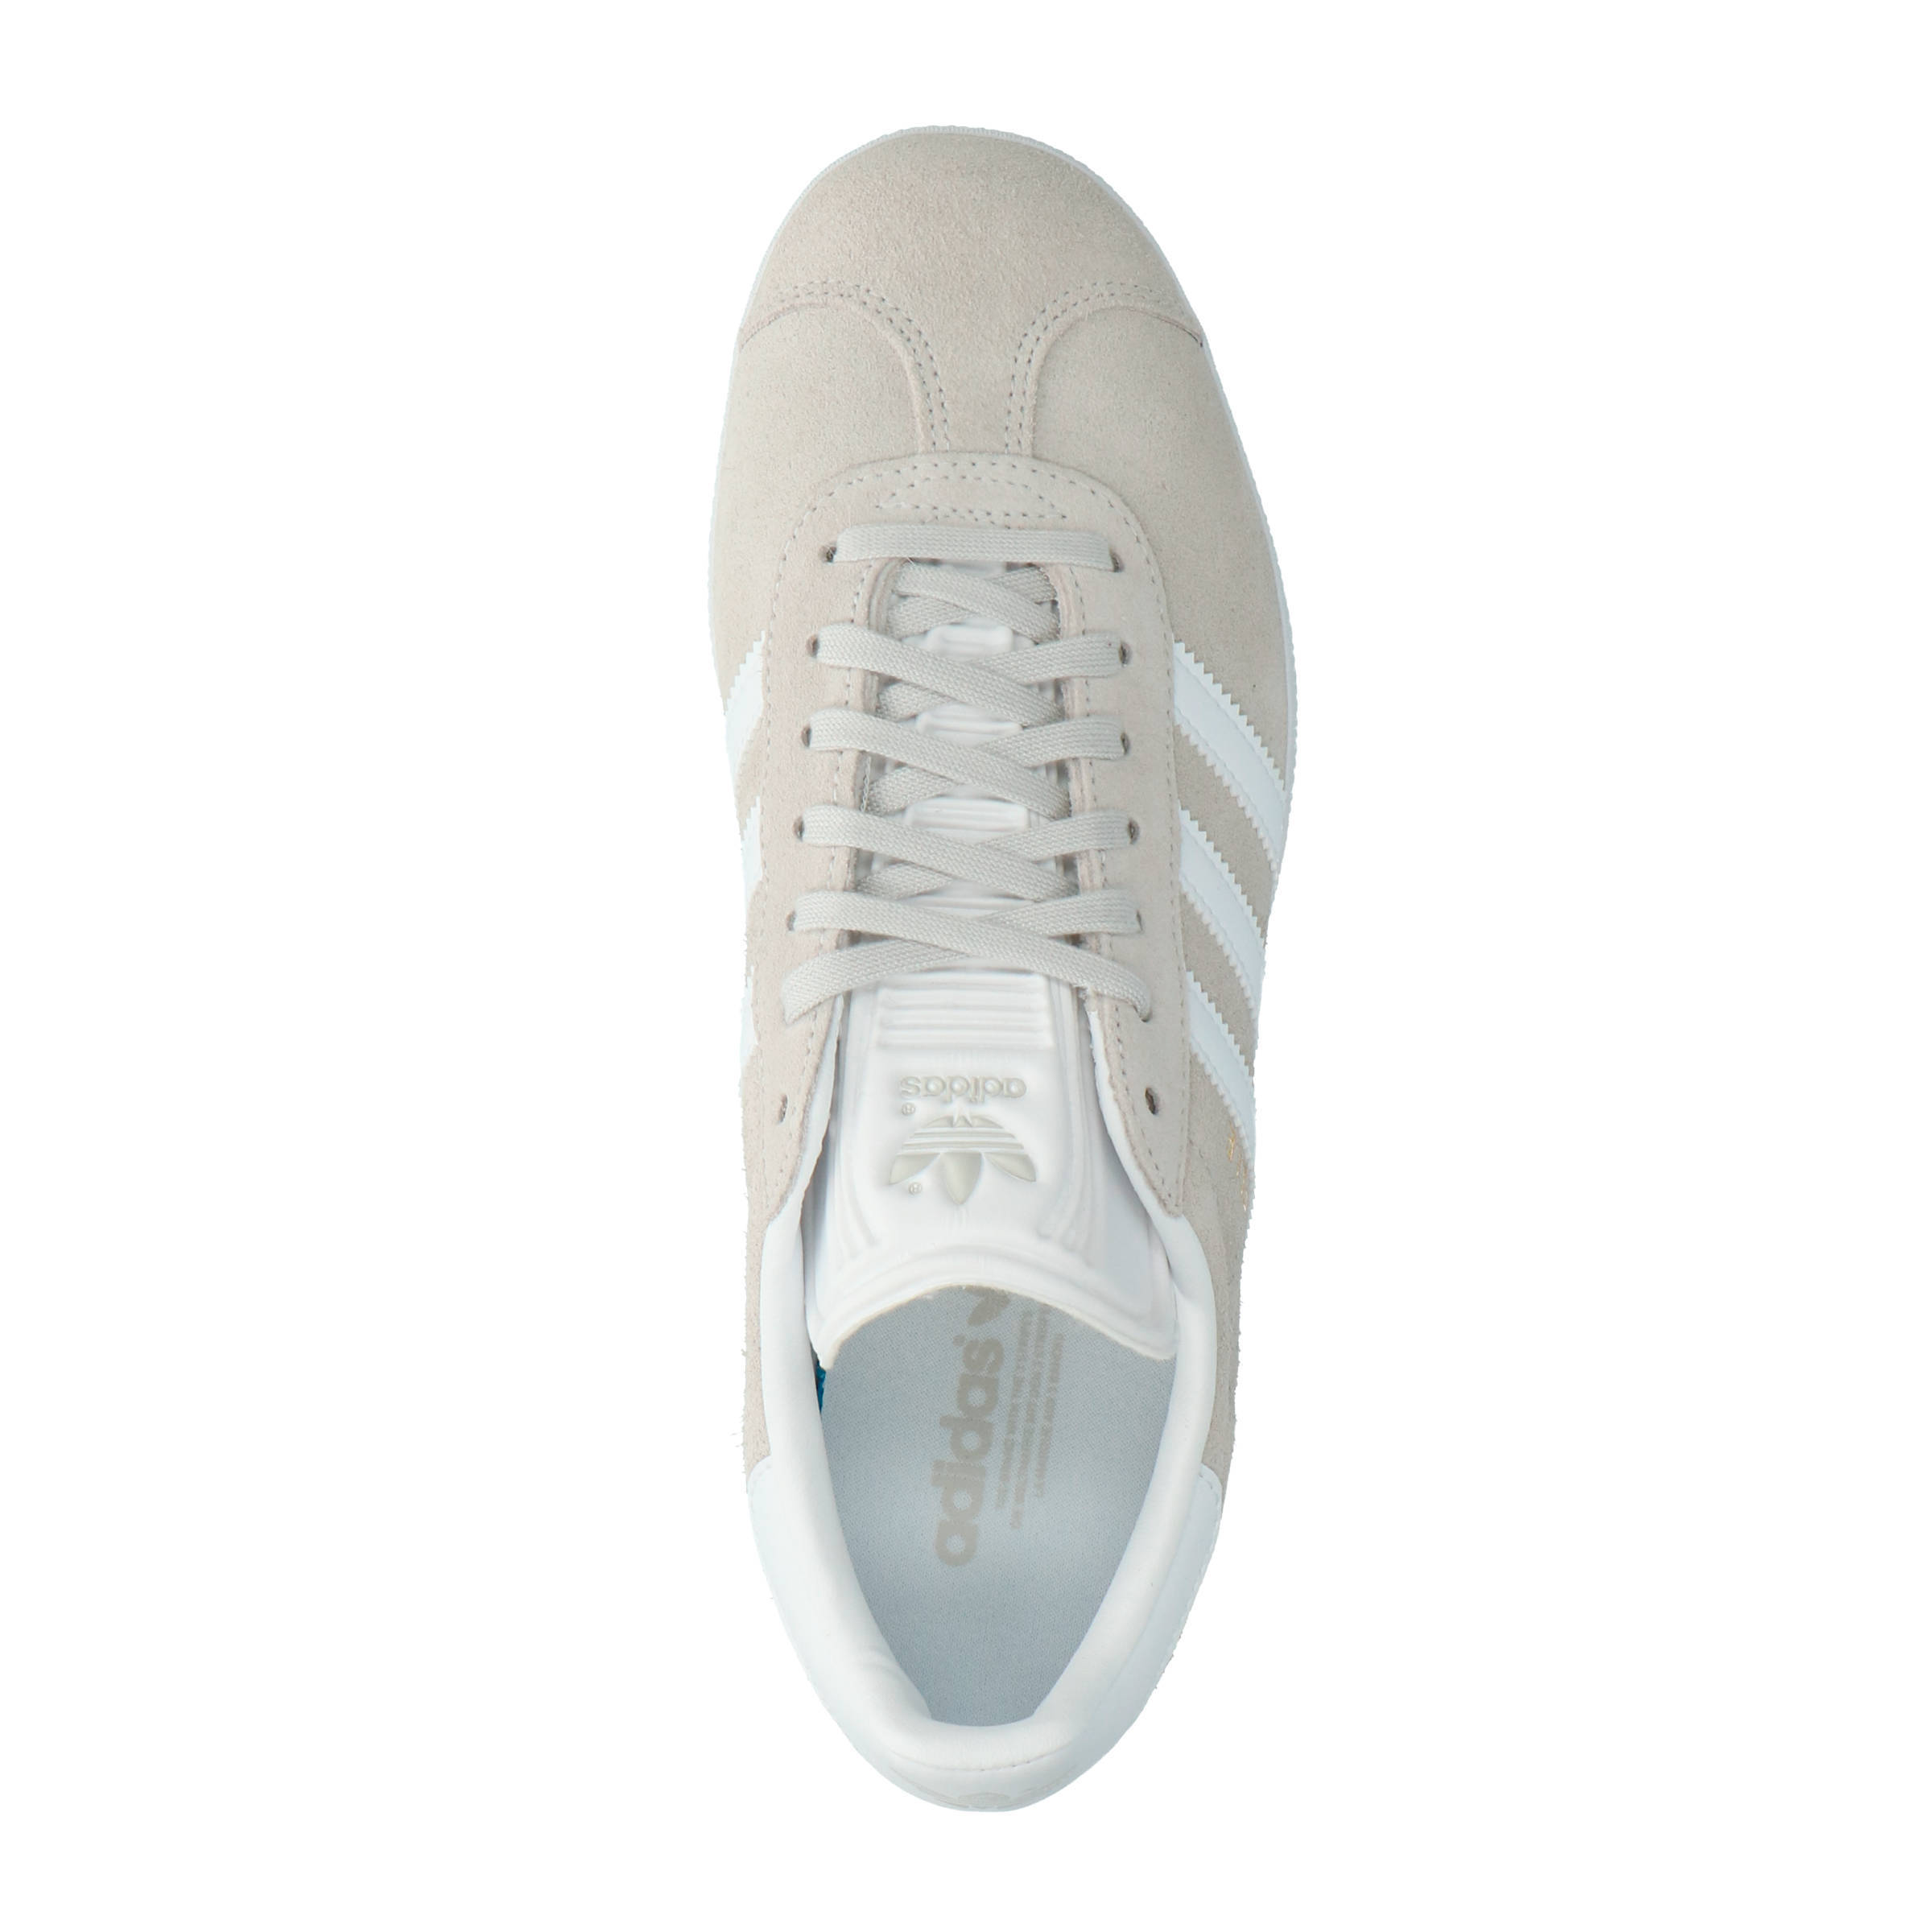 adidas dames sneakers beige 75% korting daxisweb.nl